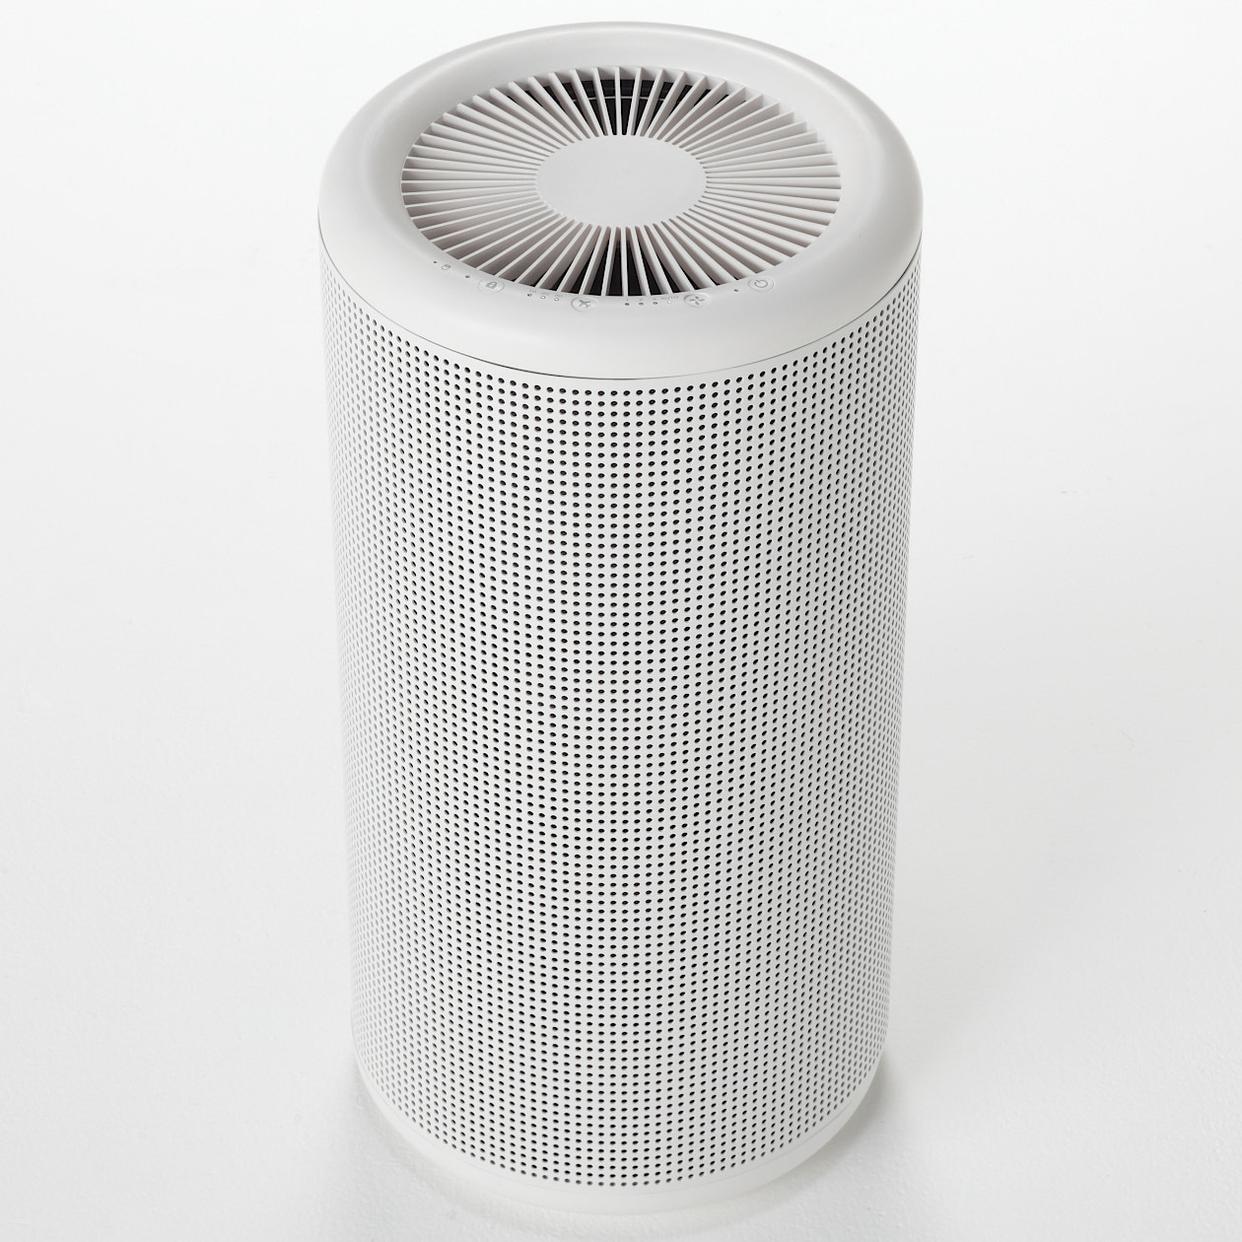 無印良品(MUJI) 空気清浄機 MJ-AP1の商品画像3